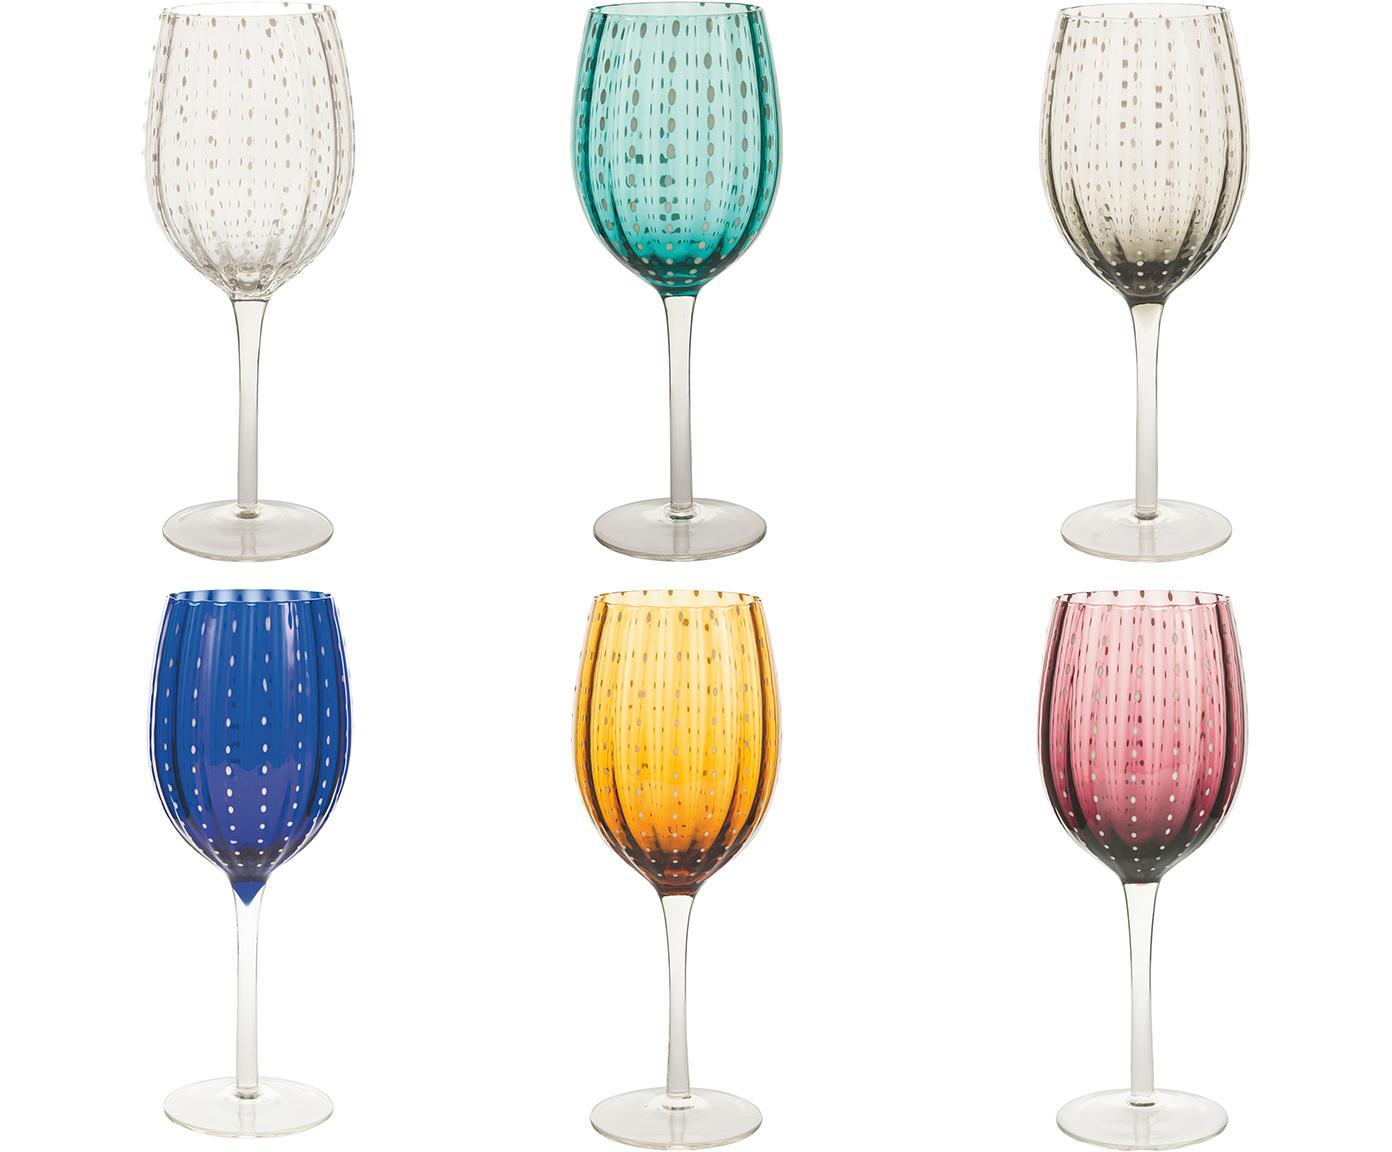 Weingläser Shiraz in Bunt, 6er-Set, Glas, Mehrfarbig, Ø 7 x H 23 cm